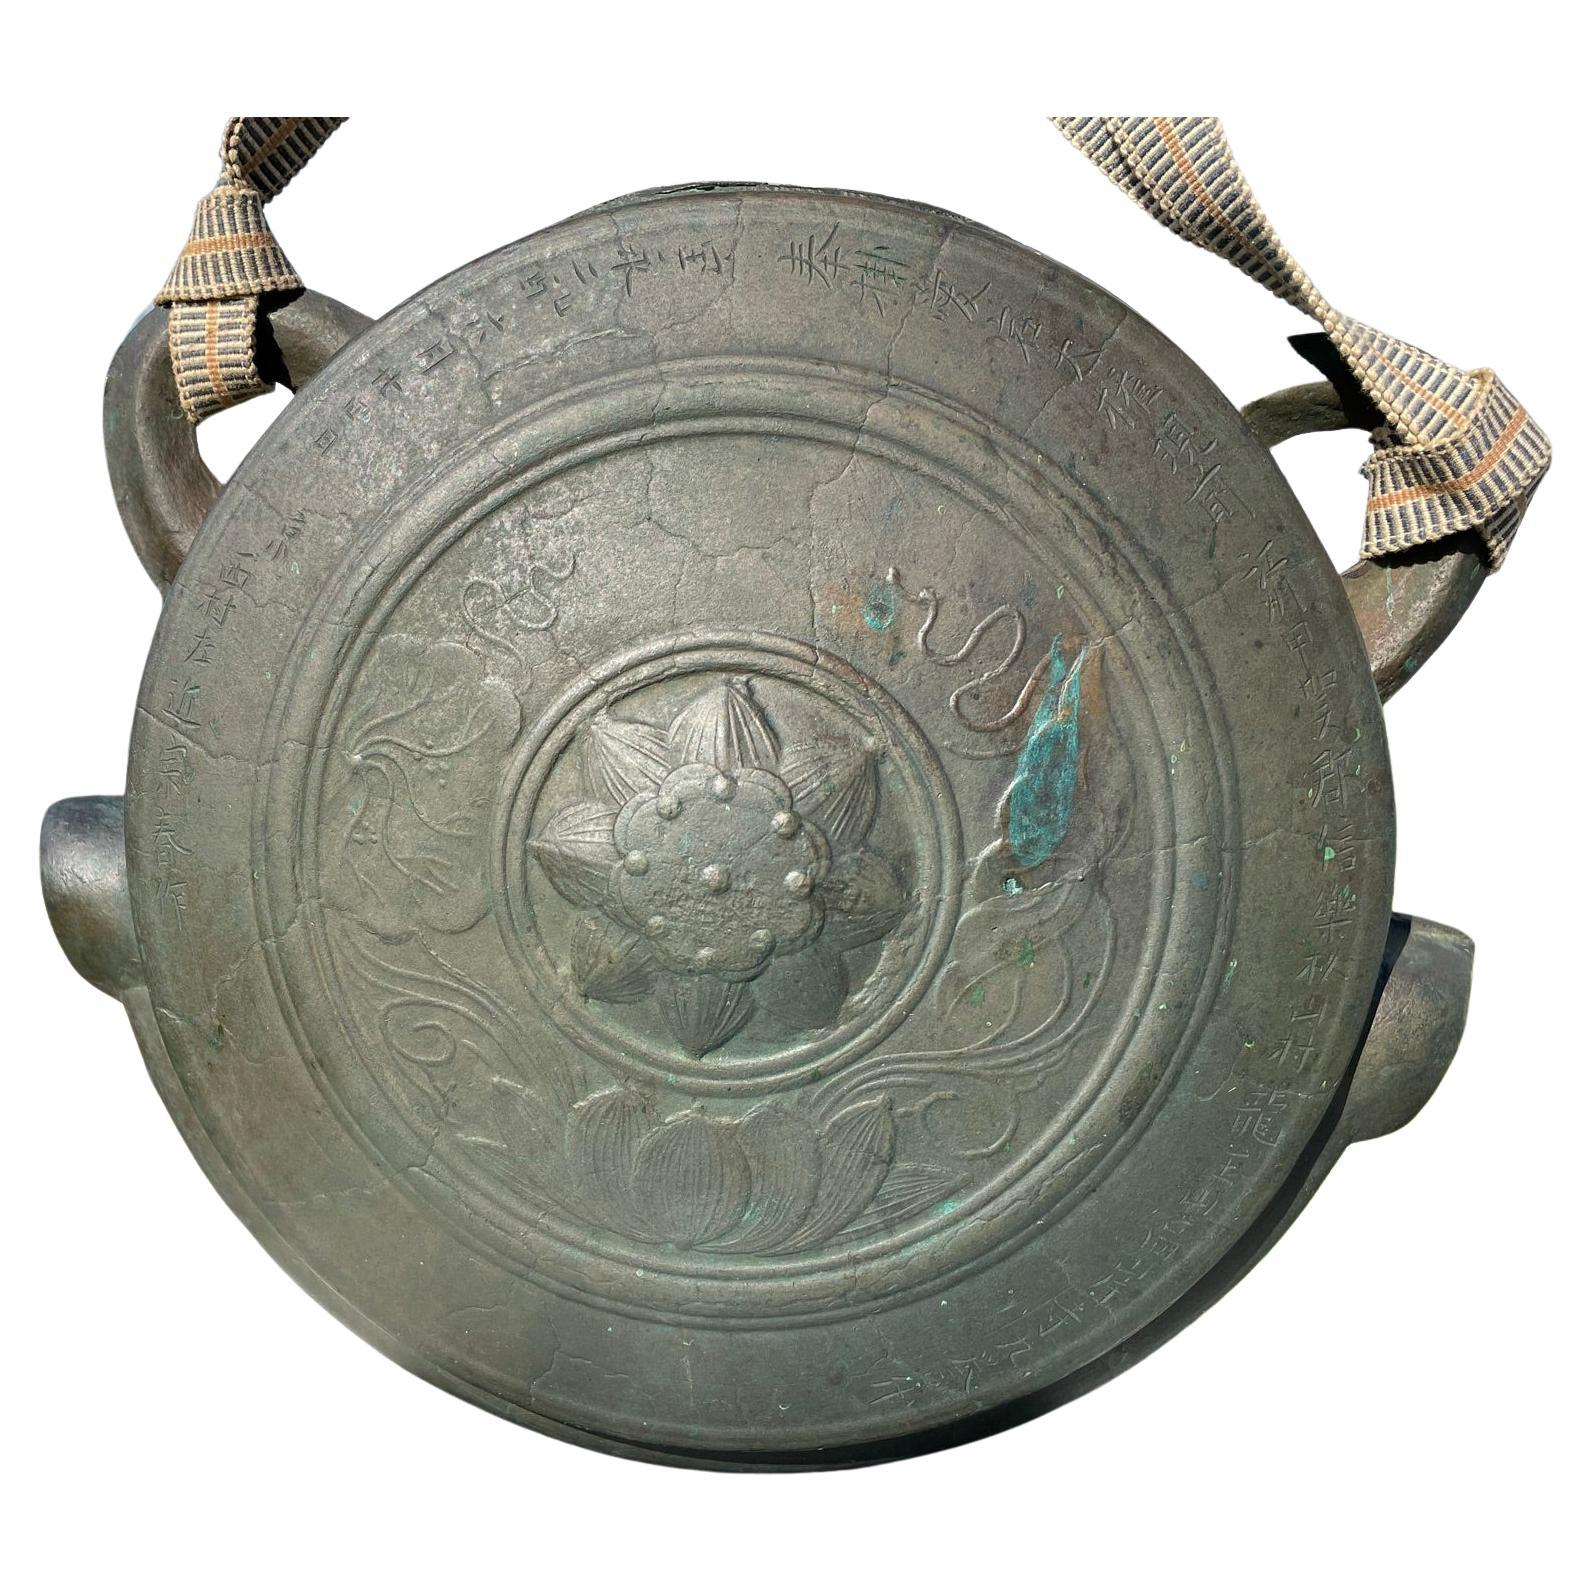 Japanese Antique Bronze Chanting Bell 1705